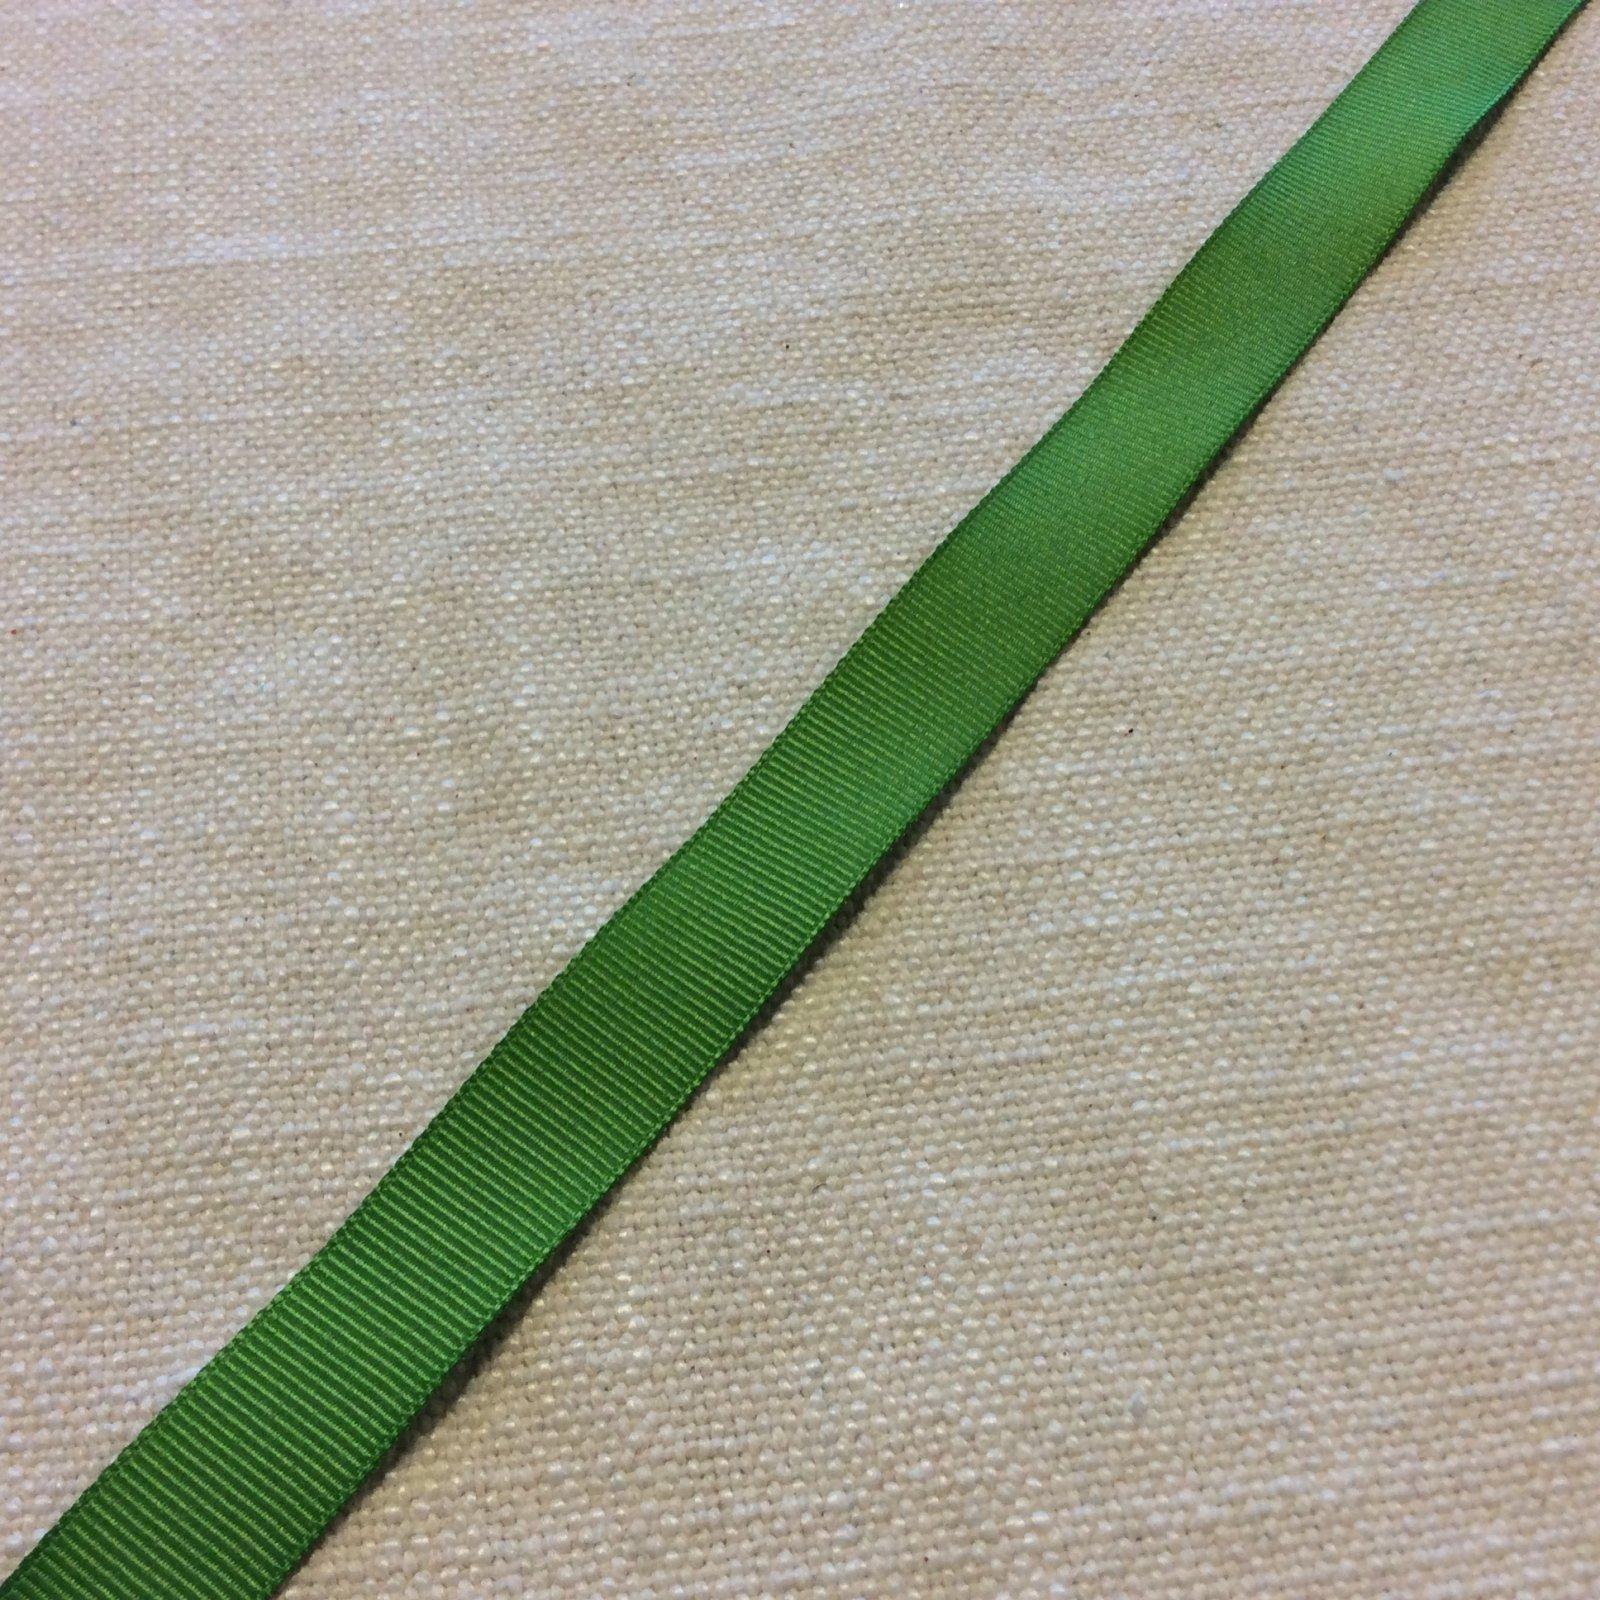 Grosgrain Ribbon Kiwi Green 5/8 Trim Ribbon RIB1114